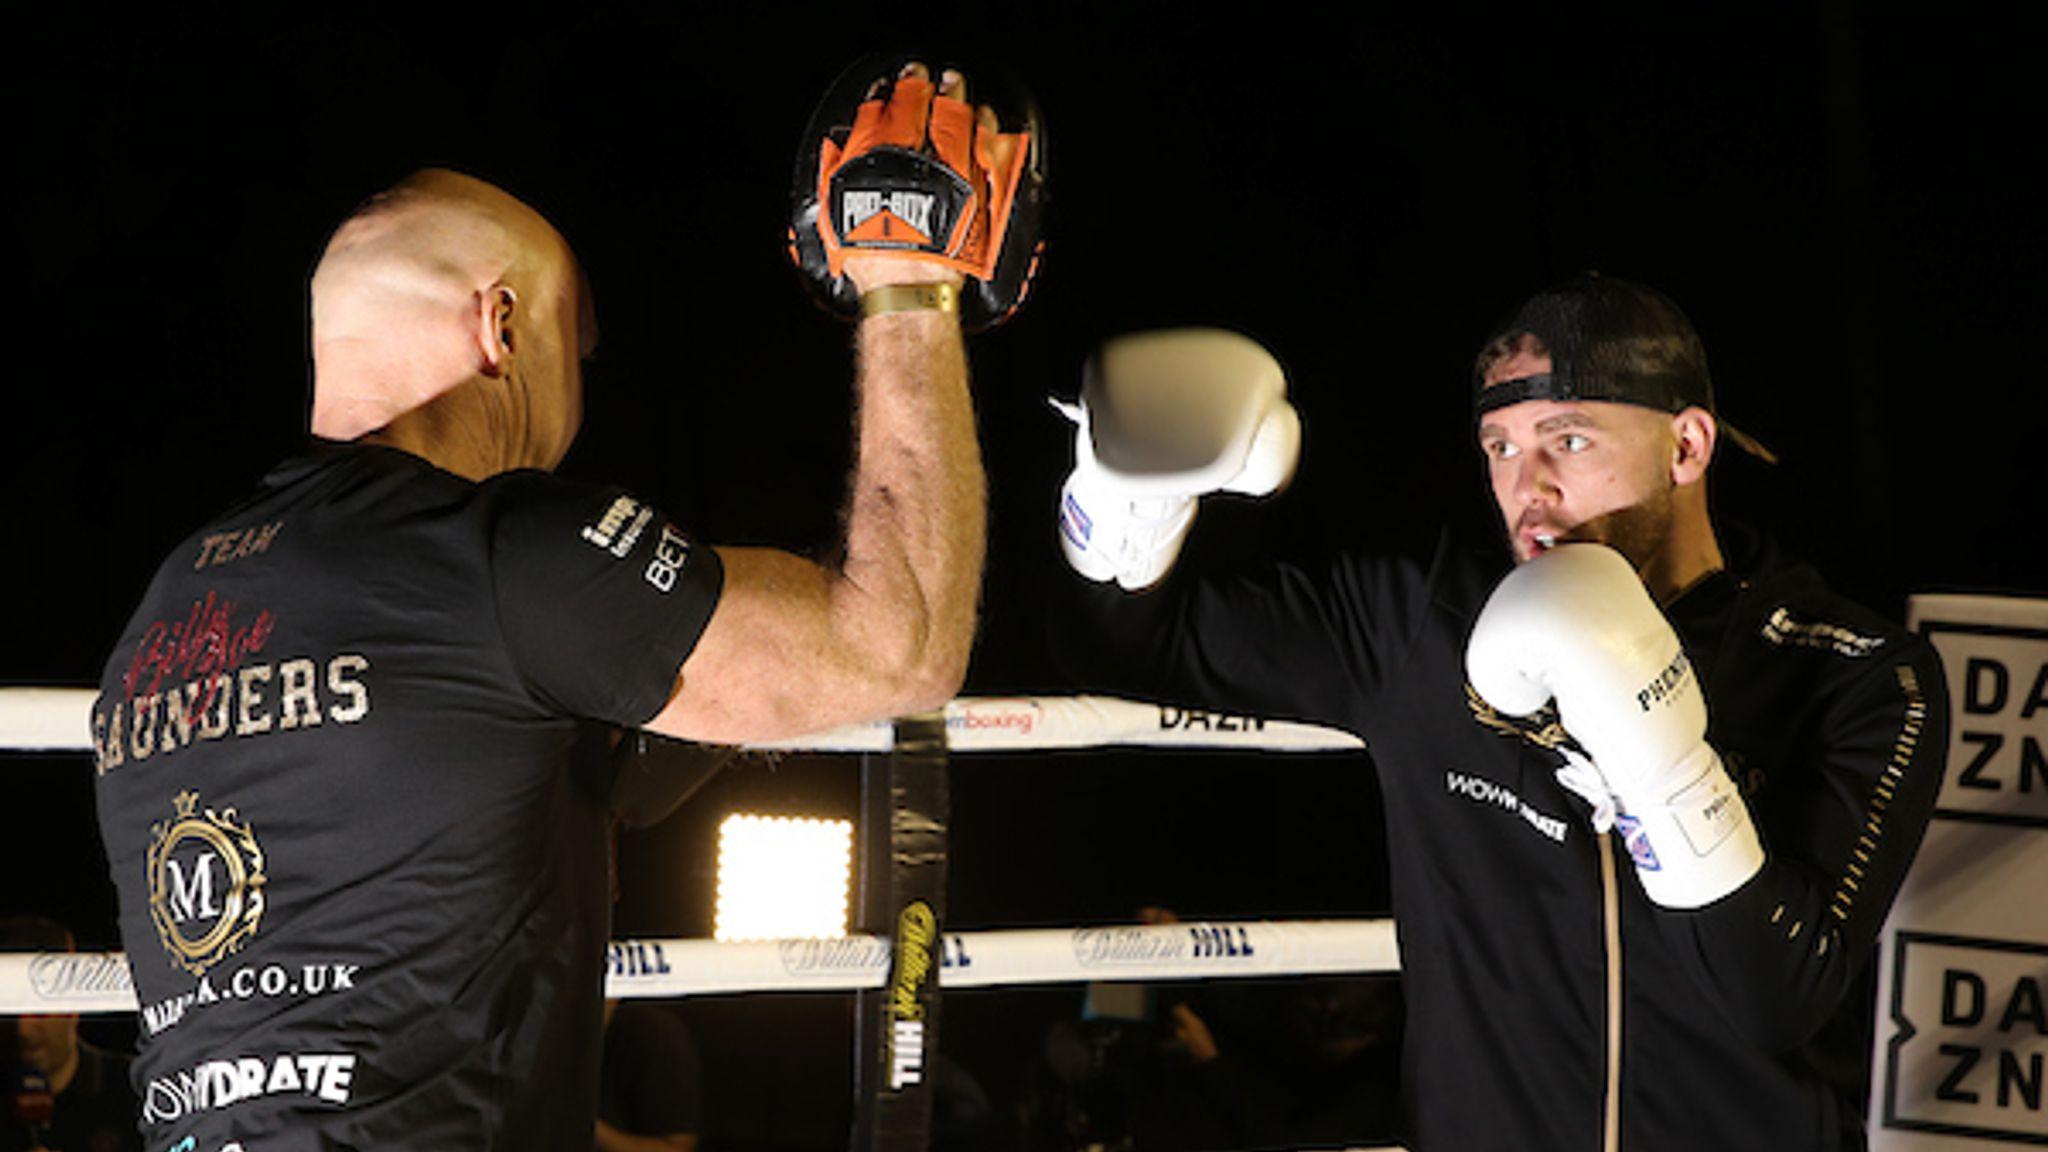 KSI vs Logan Paul 2: Billy Joe Saunders wants to undo No 1 target 'Canelo' Alvarez in 2020